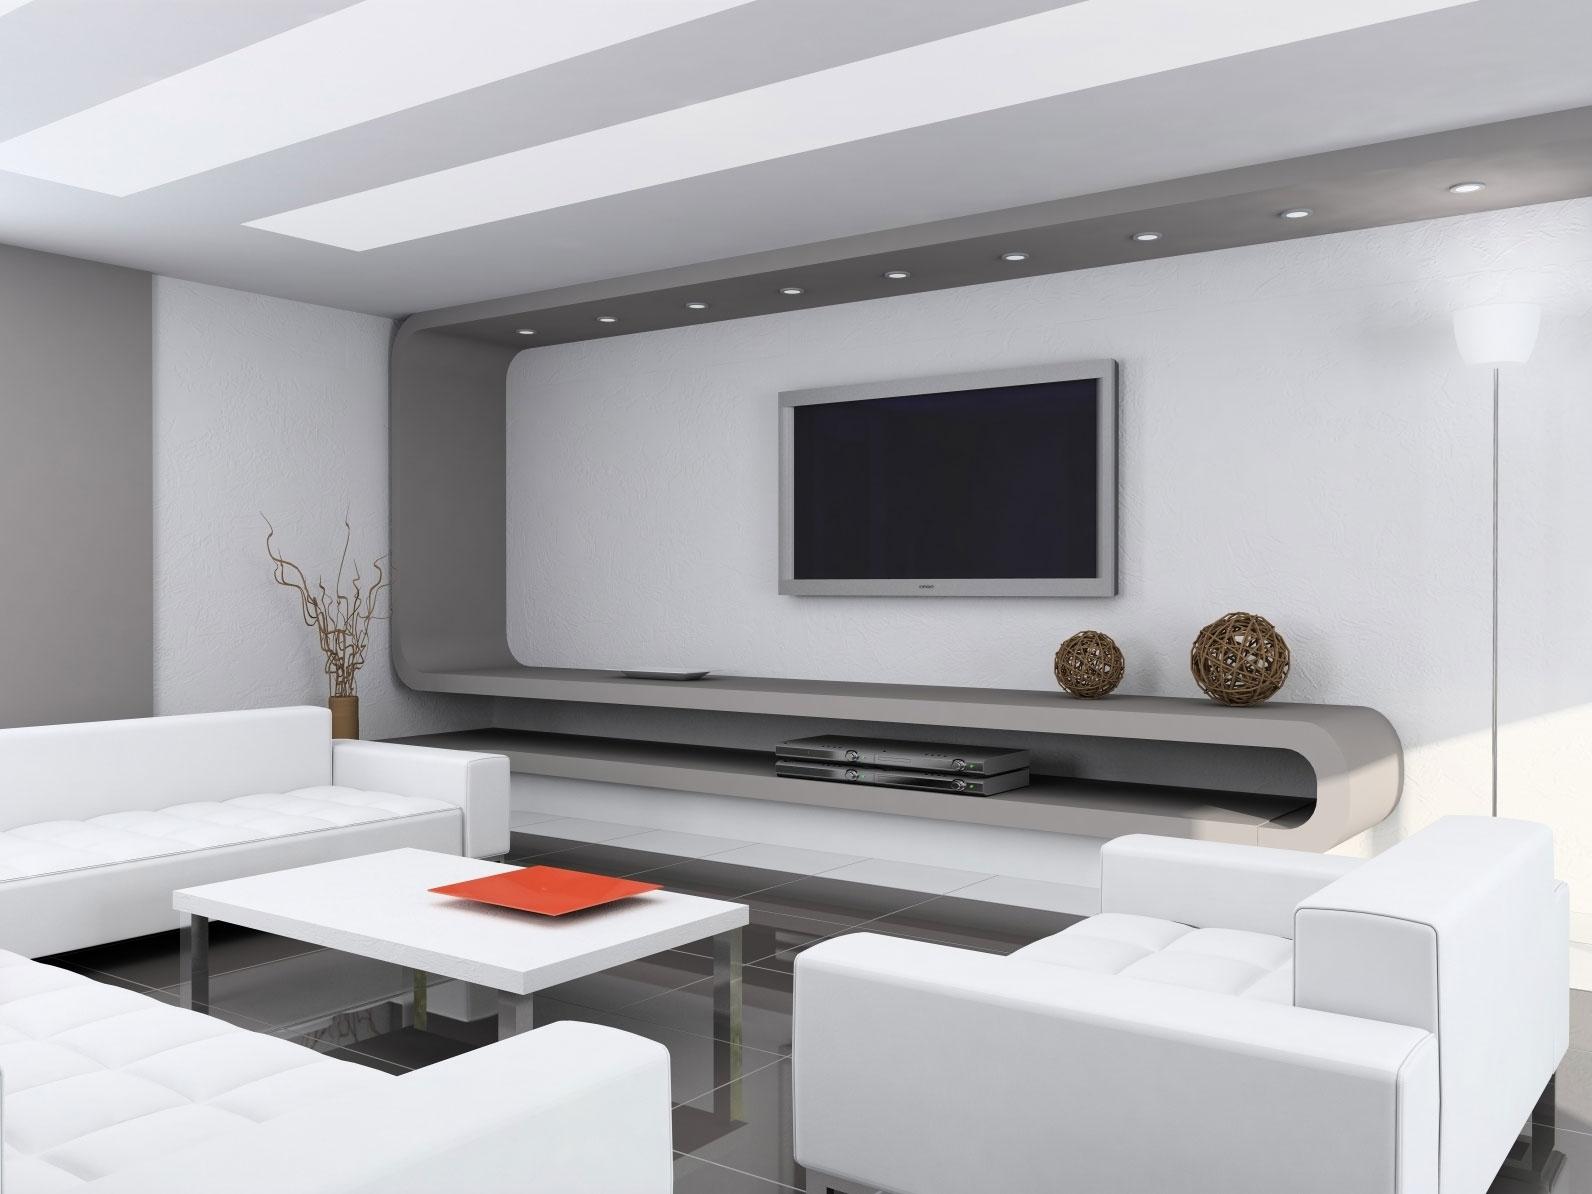 design kitchens on interior design: interior design ideas, house interior design